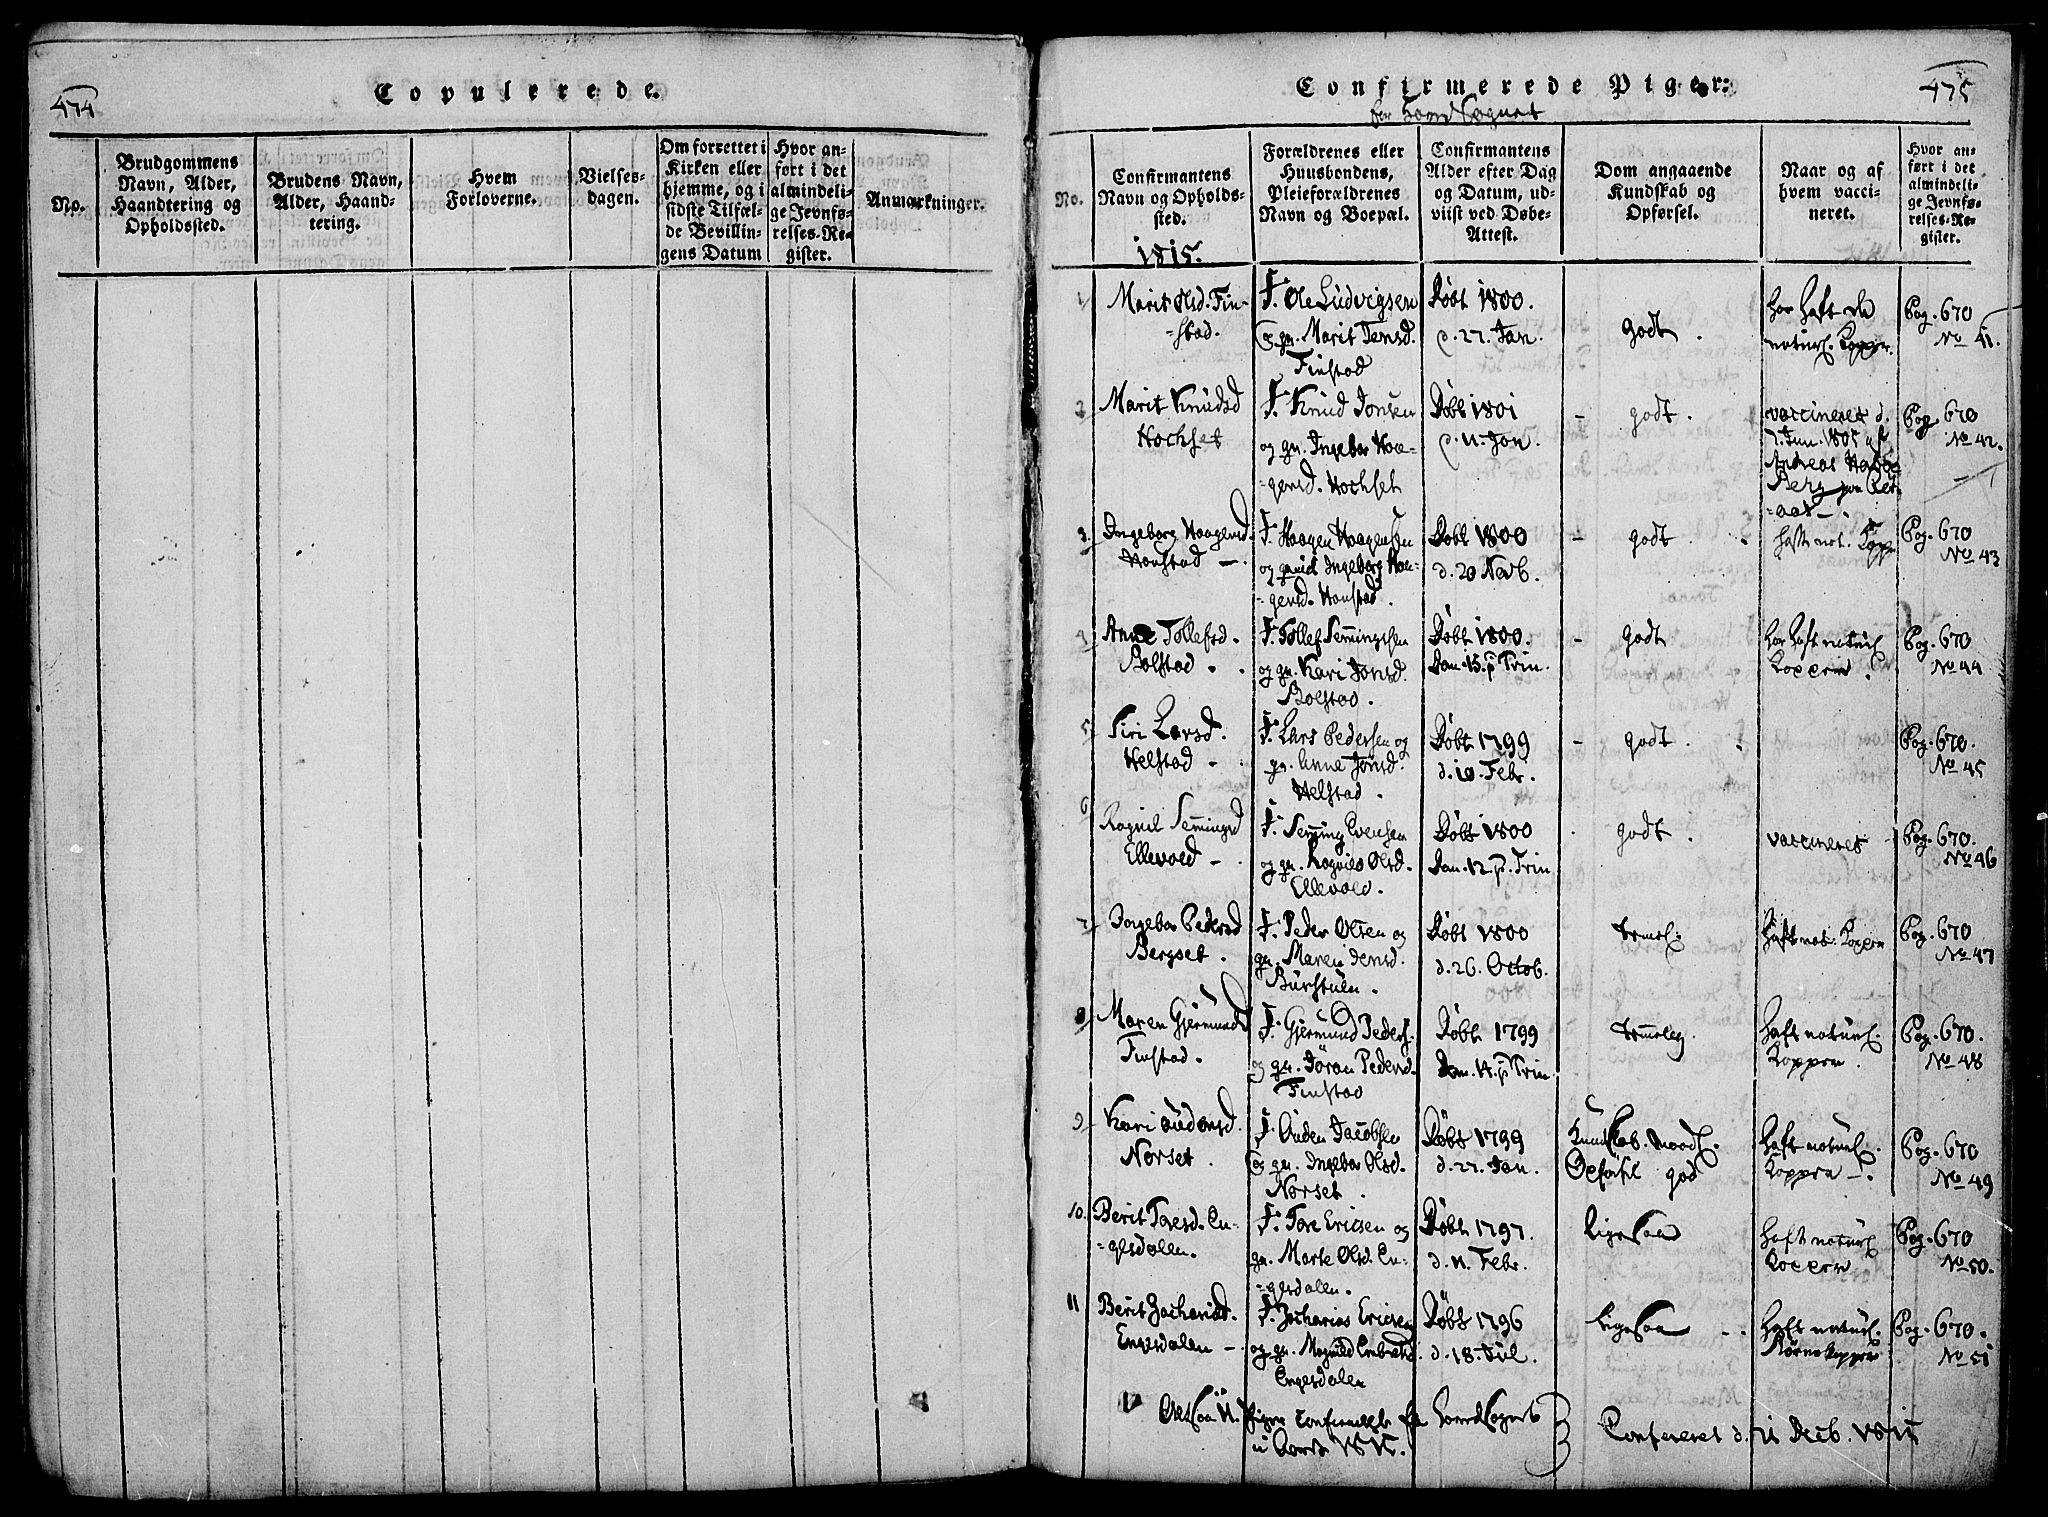 SAH, Rendalen prestekontor, H/Ha/Haa/L0003: Ministerialbok nr. 3, 1815-1829, s. 474-475